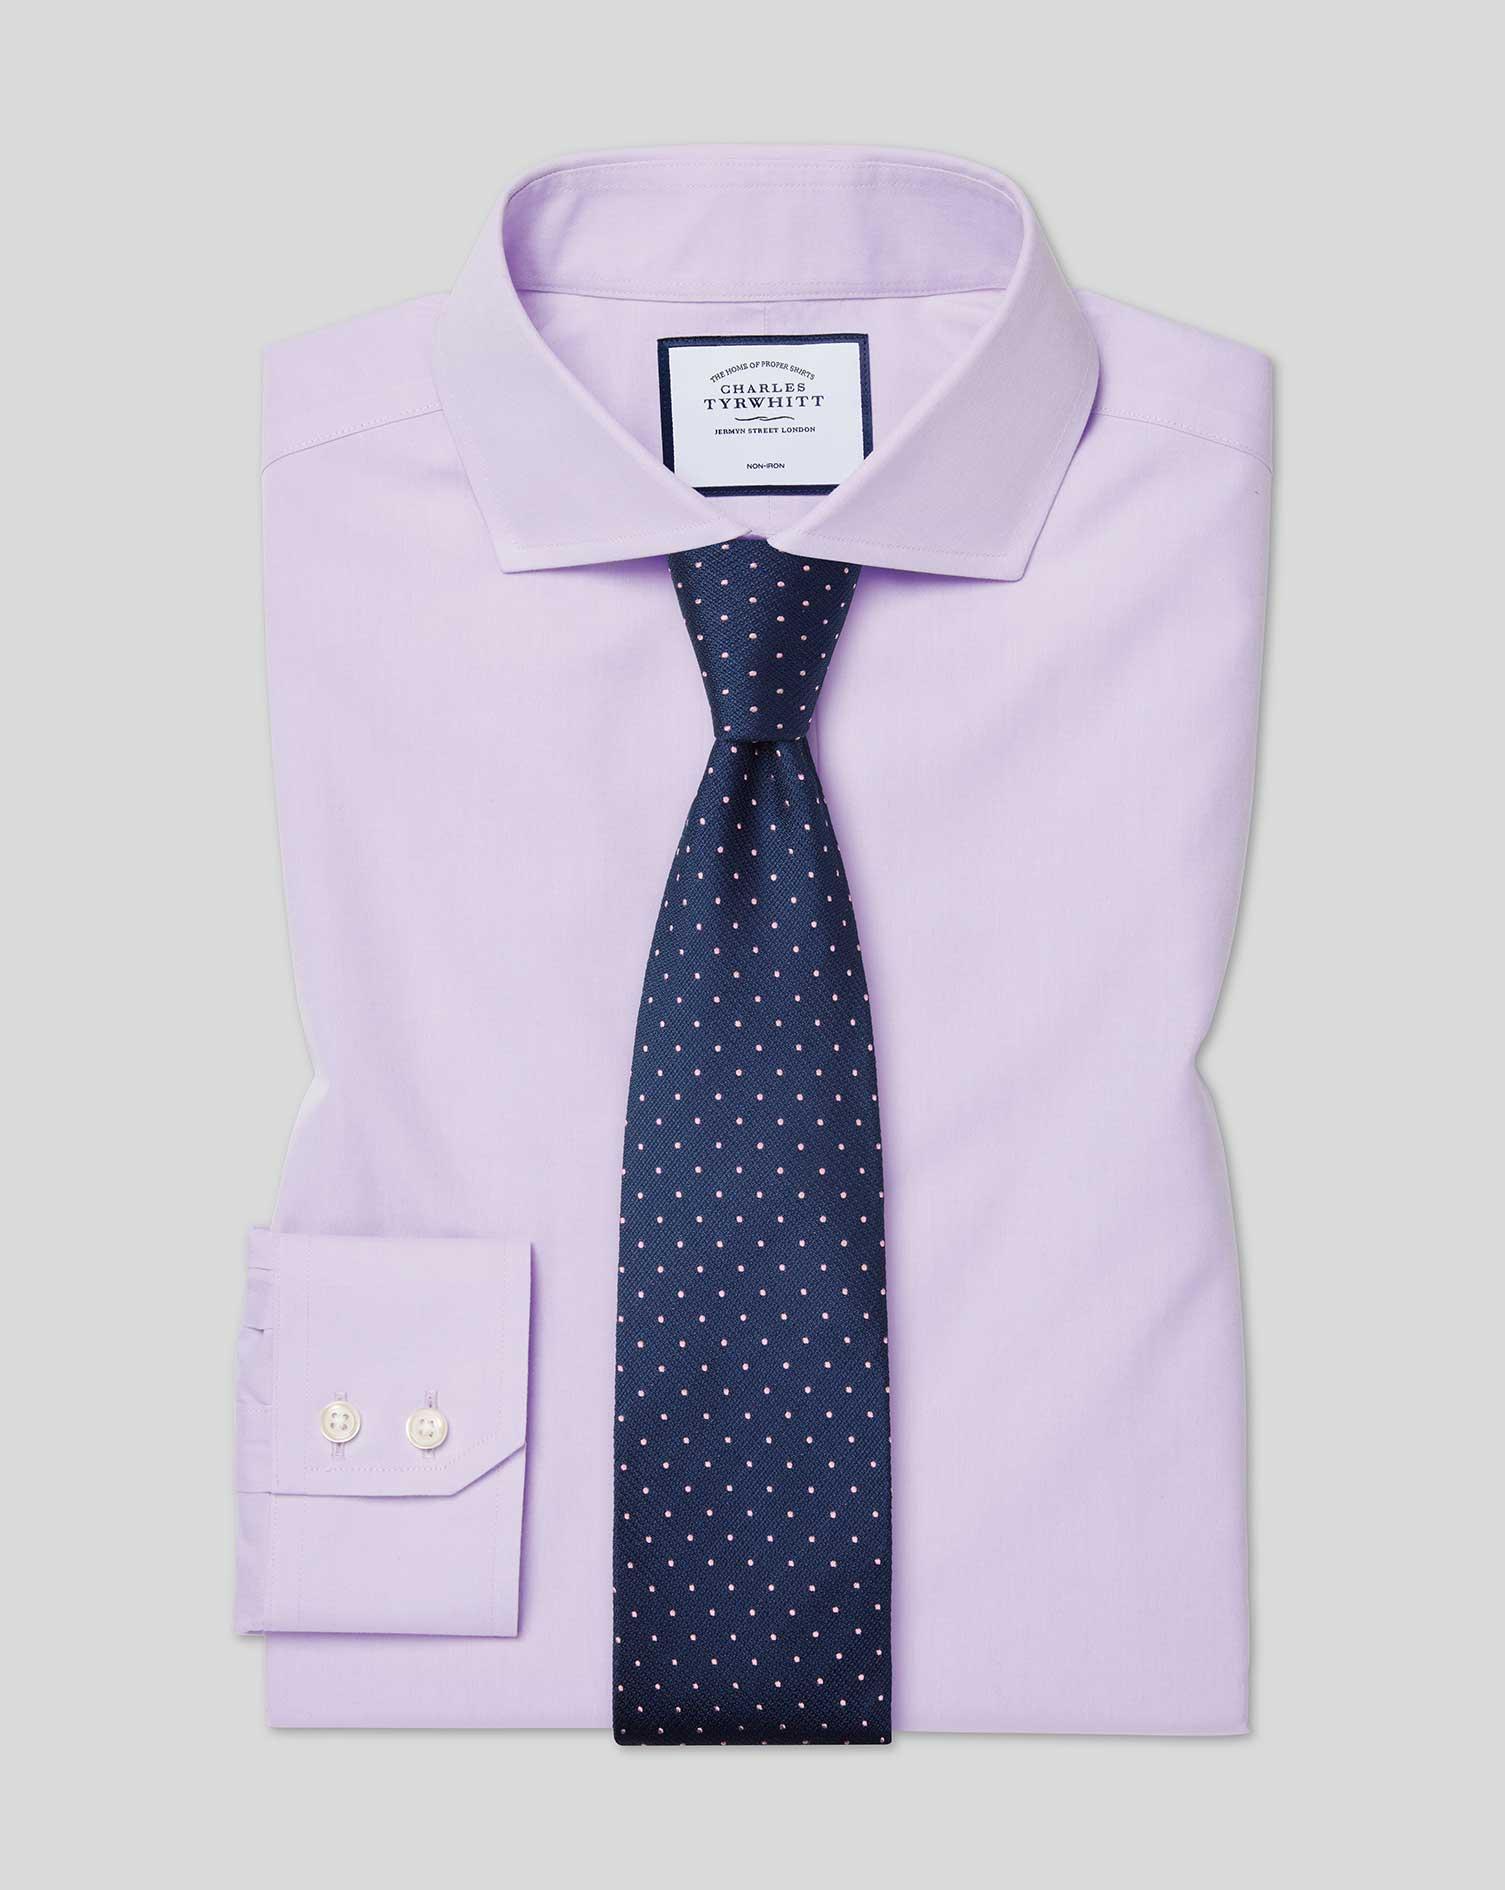 Extra Slim Fit Non-Iron Cutaway Collar Poplin Lilac Cotton Formal Shirt Single Cuff Size 17/36 by Ch